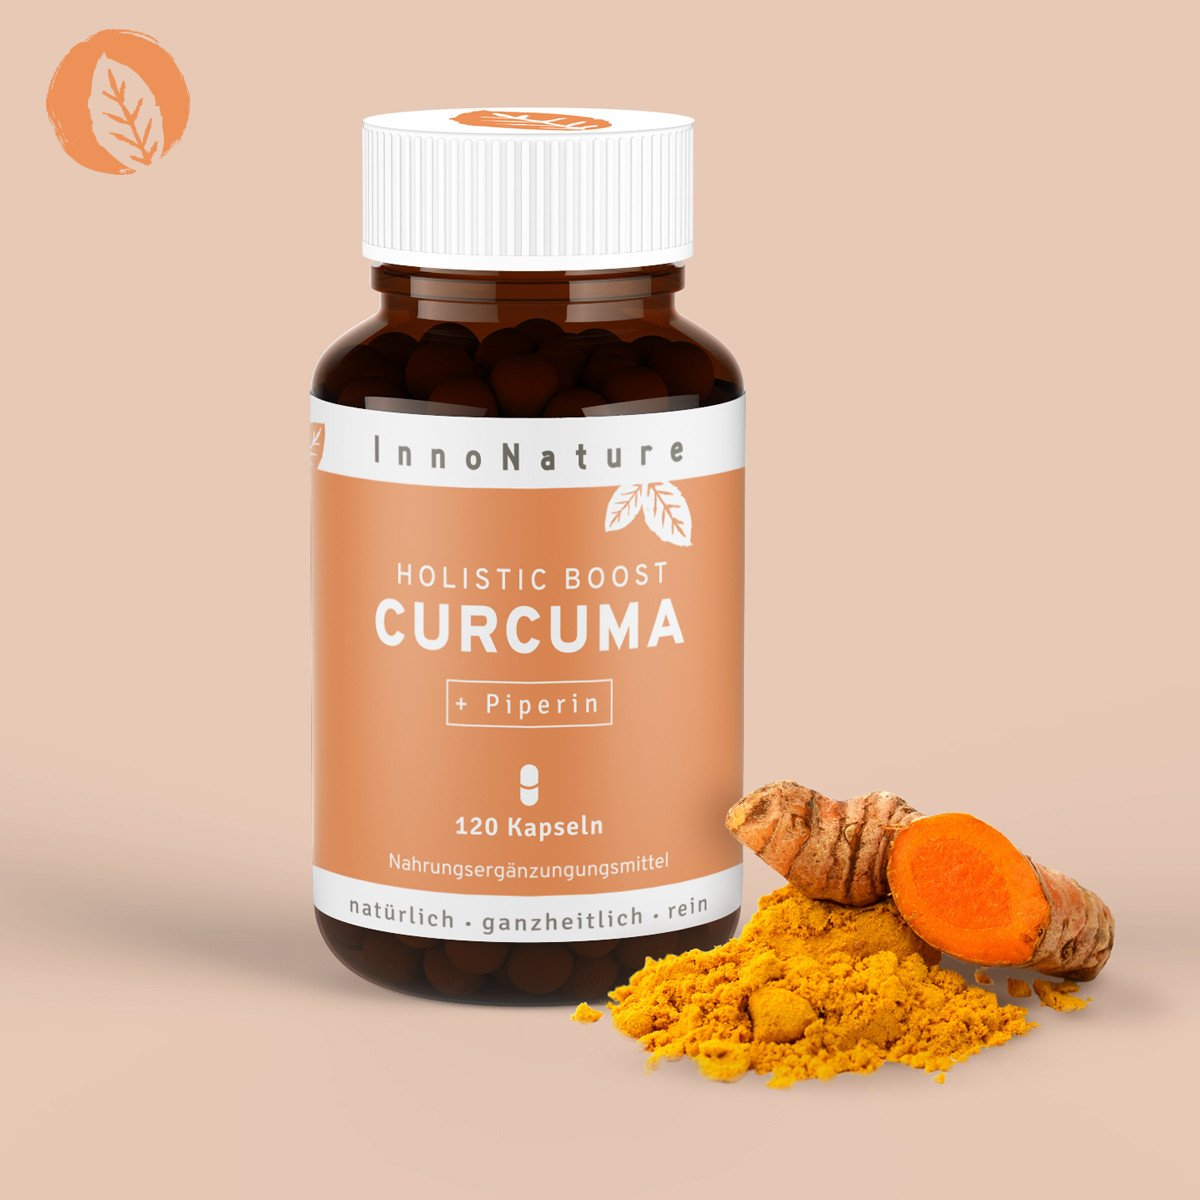 vegane Nahrungsergänzungsmittel - Curcuma InnoNature